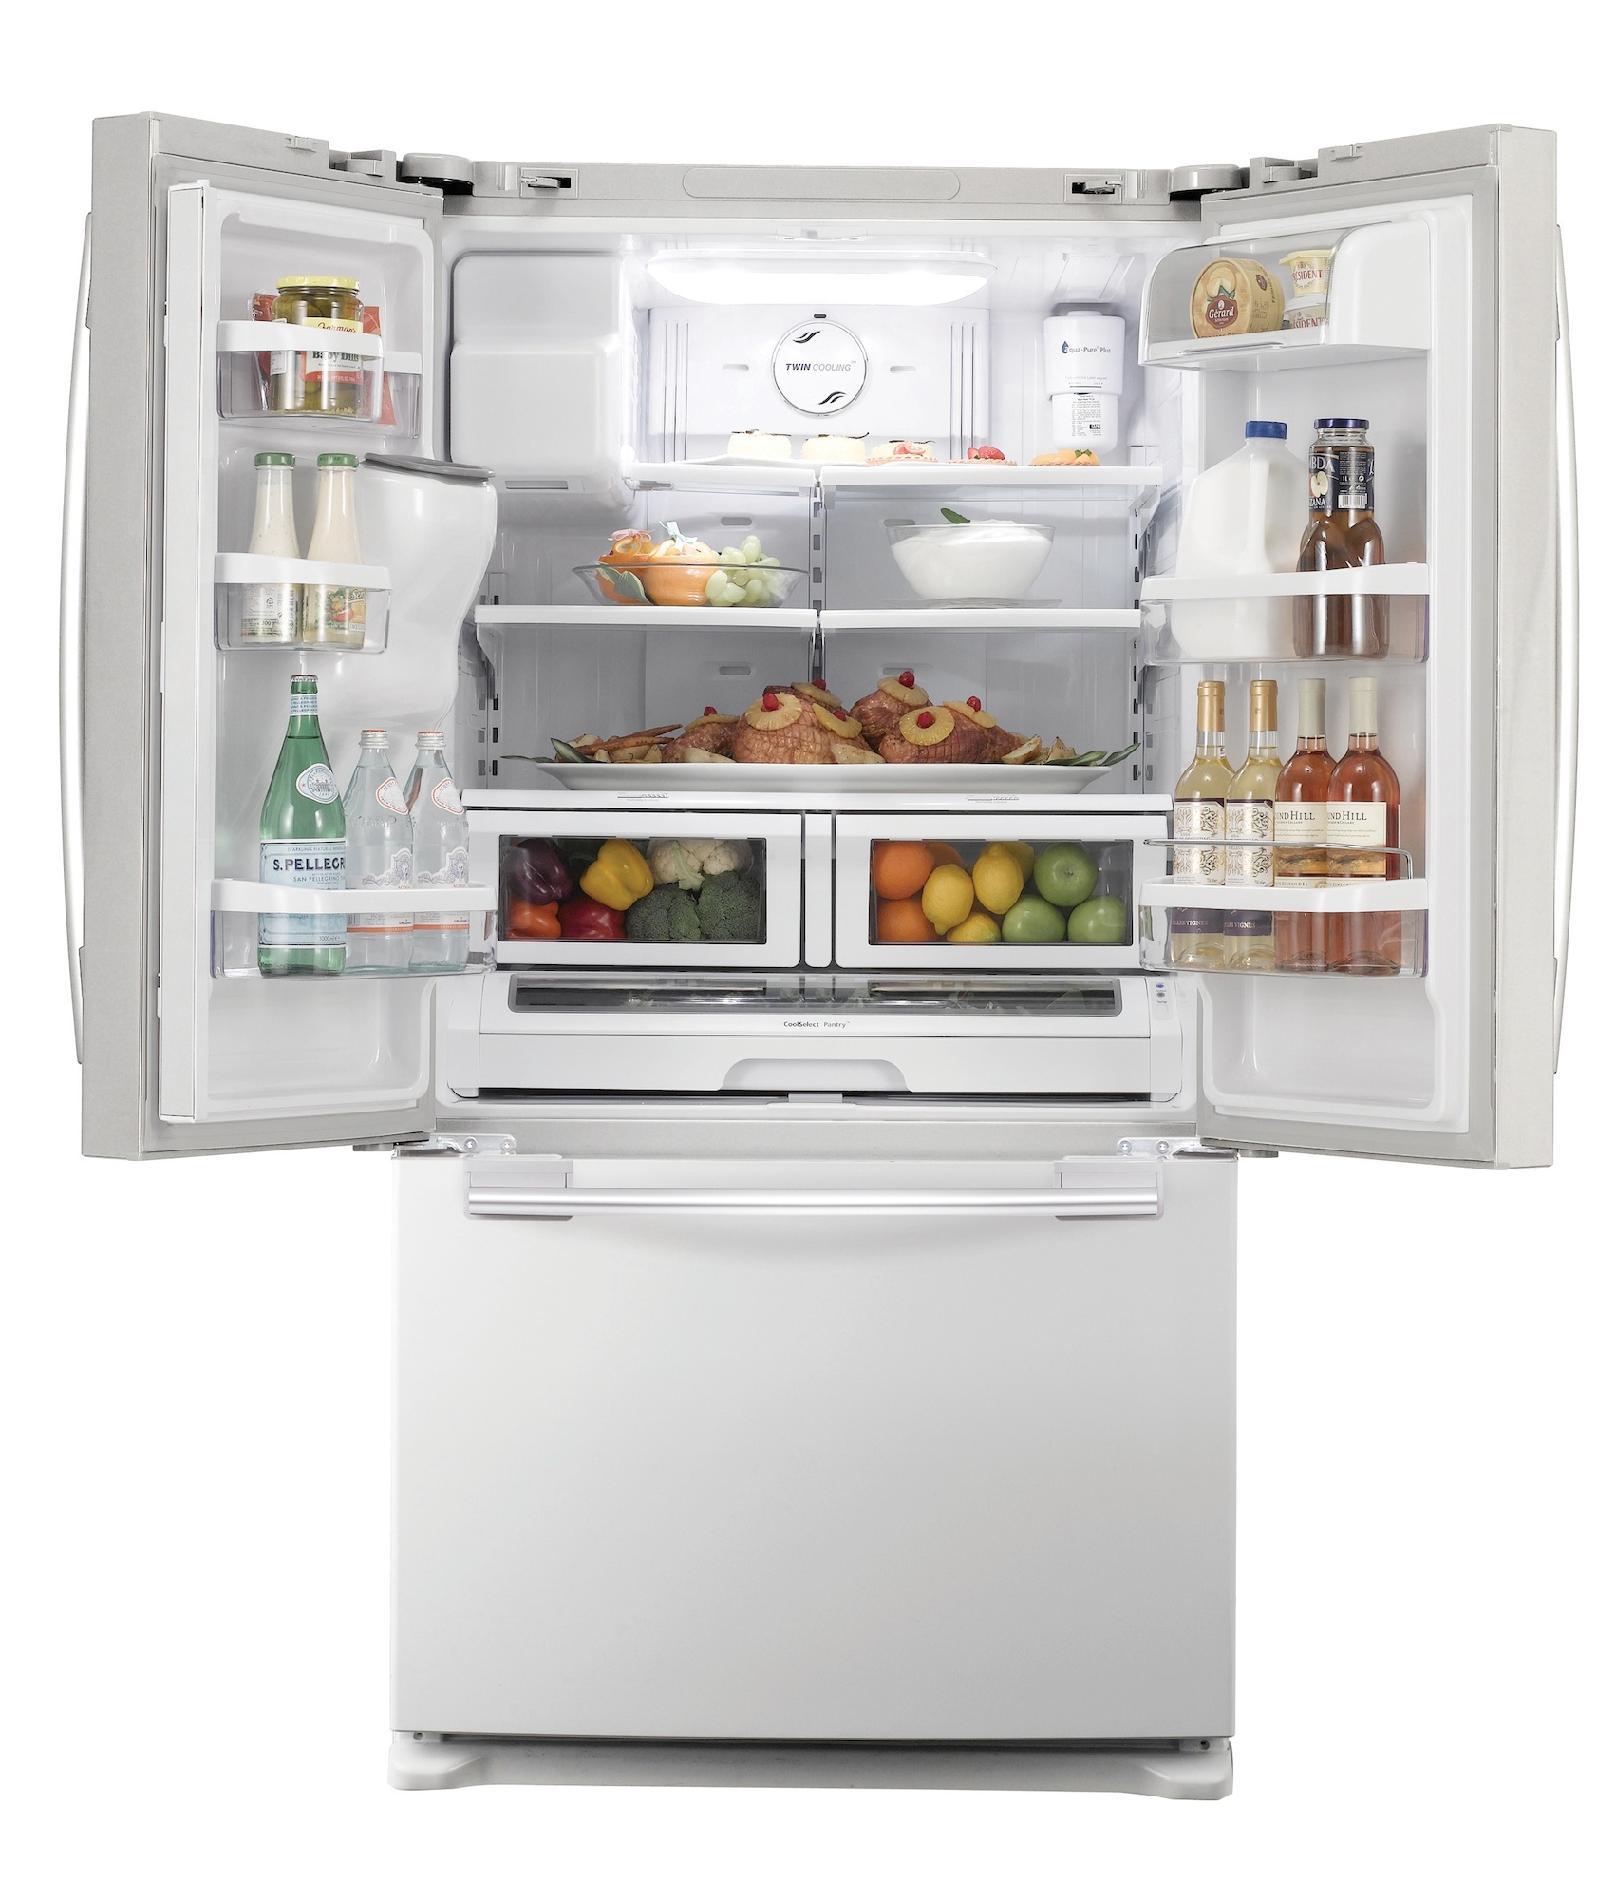 Samsung 26 cu. ft. French Door Refrigerator - White